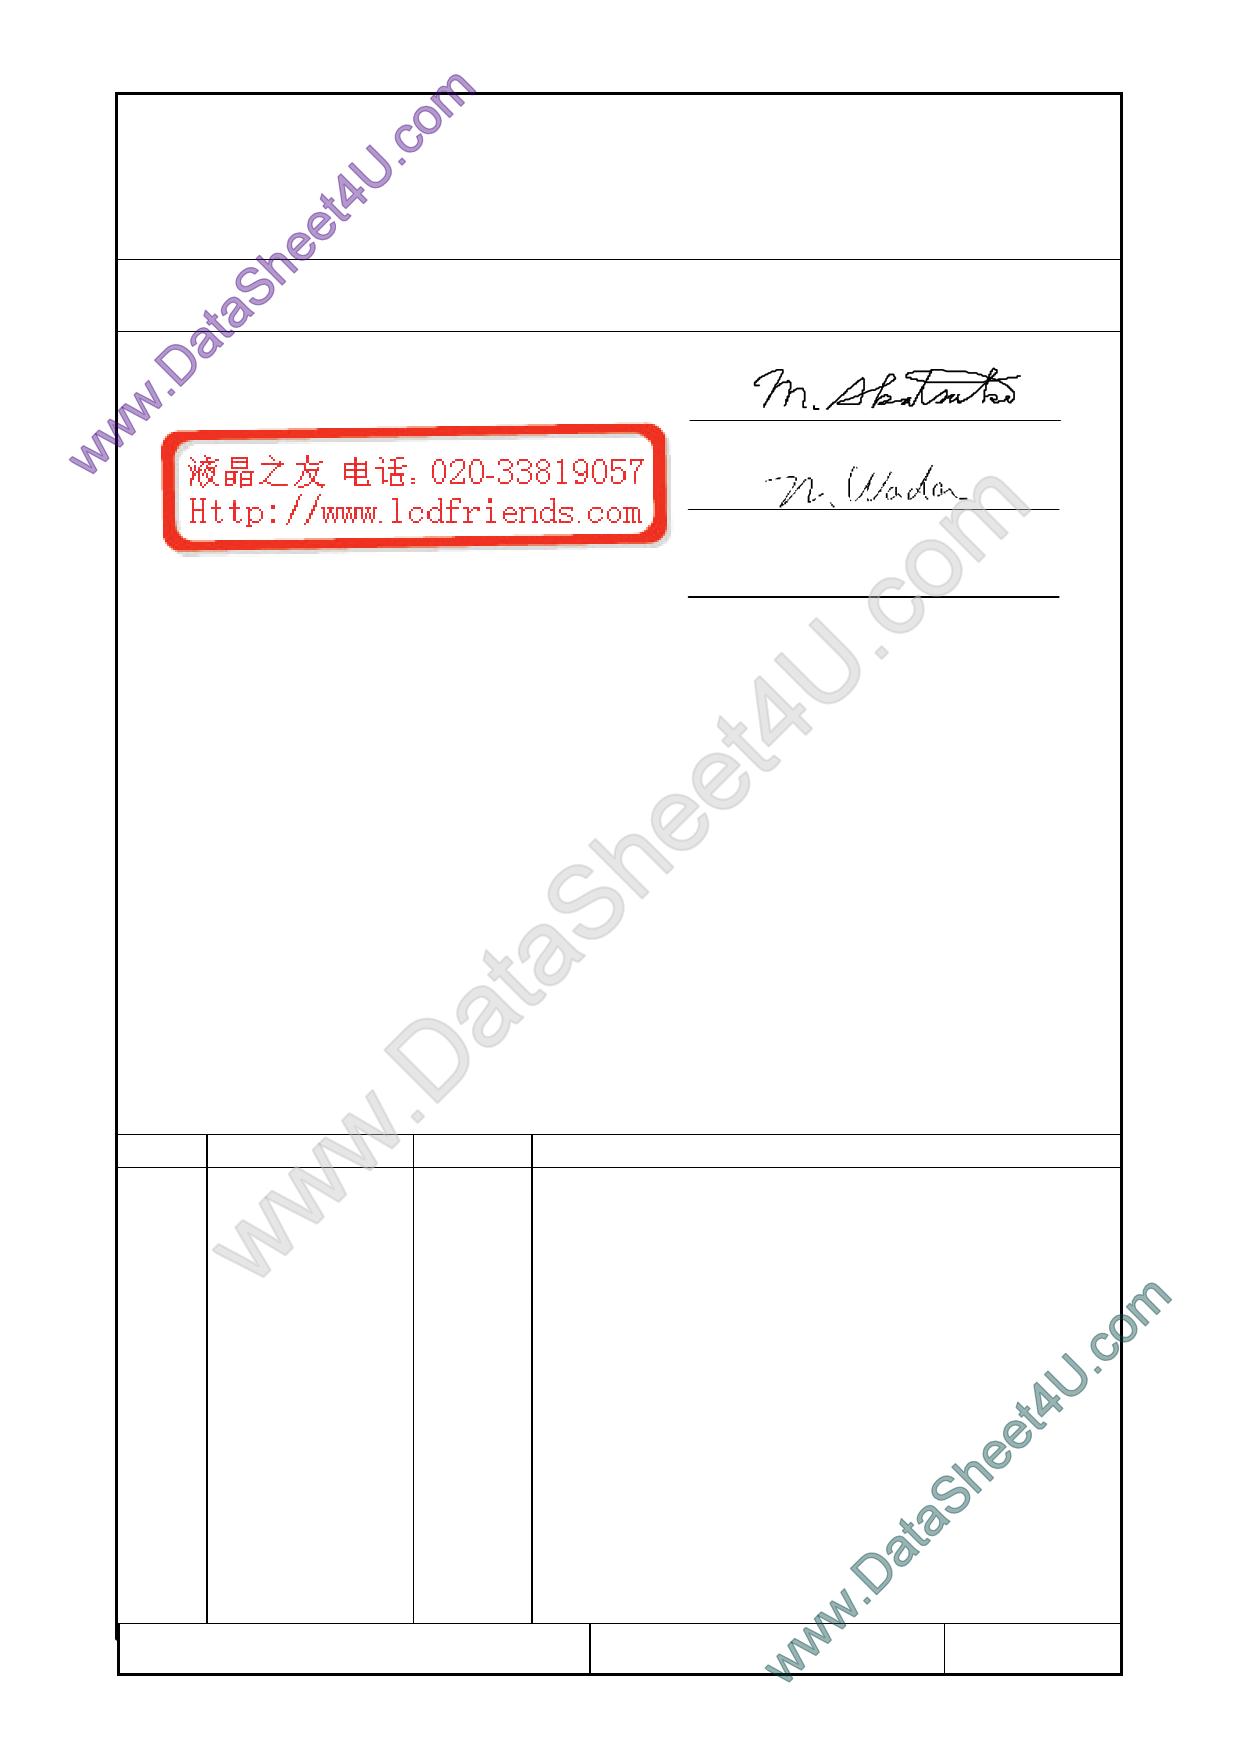 F-51851GNFQJ-LB-ABN Даташит, Описание, Даташиты